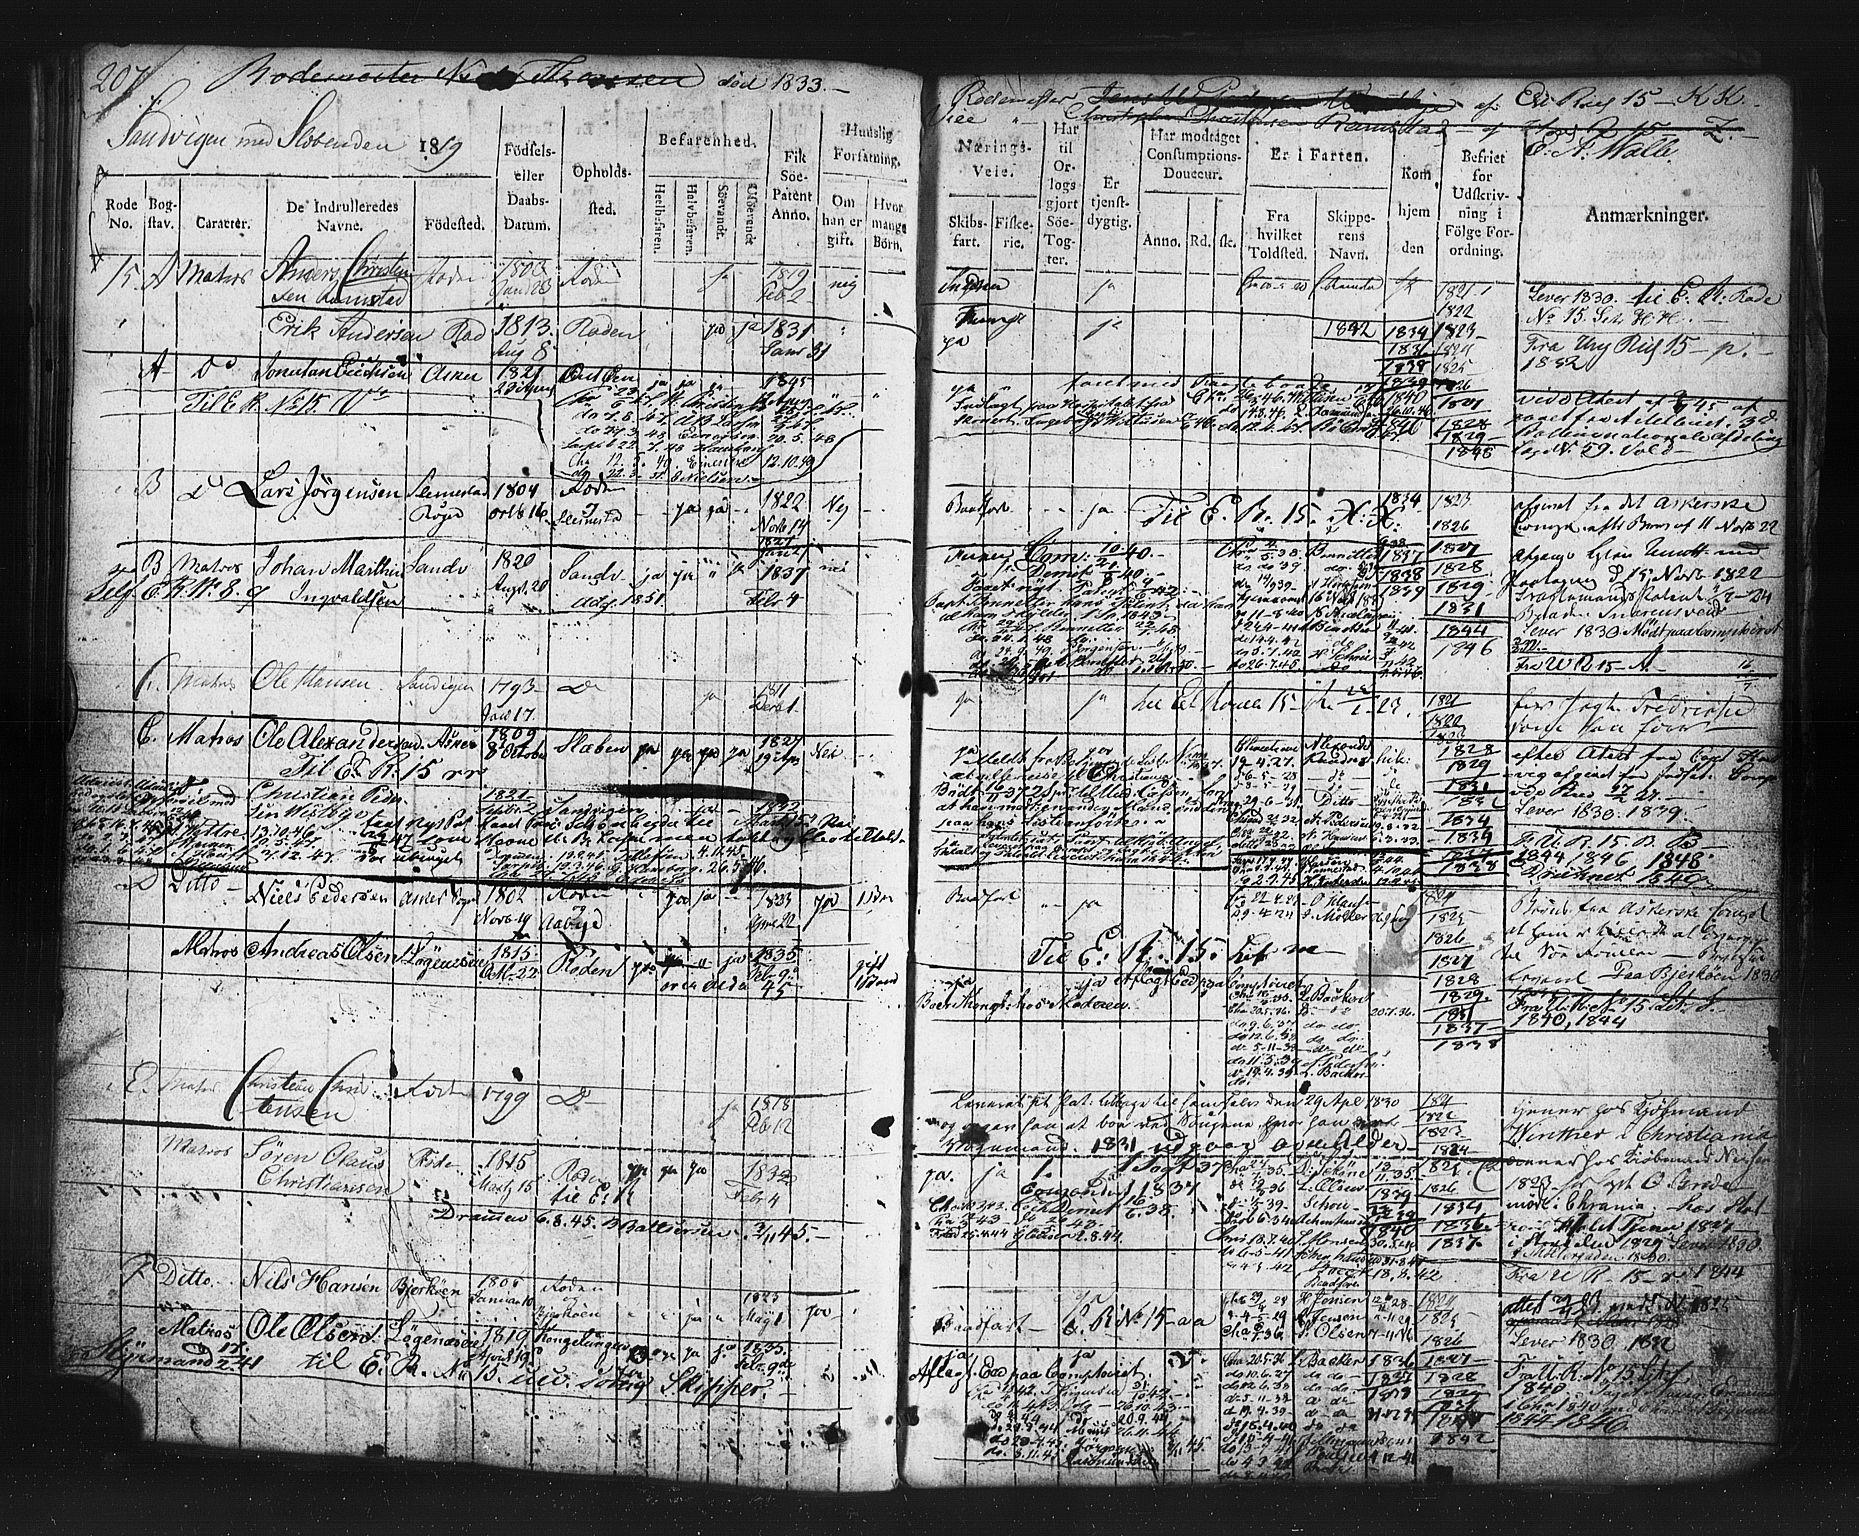 SAO, Oslo mønstringskontor, F/Fc/Fcb/L0001: Hovedrulle, 1819, s. 207